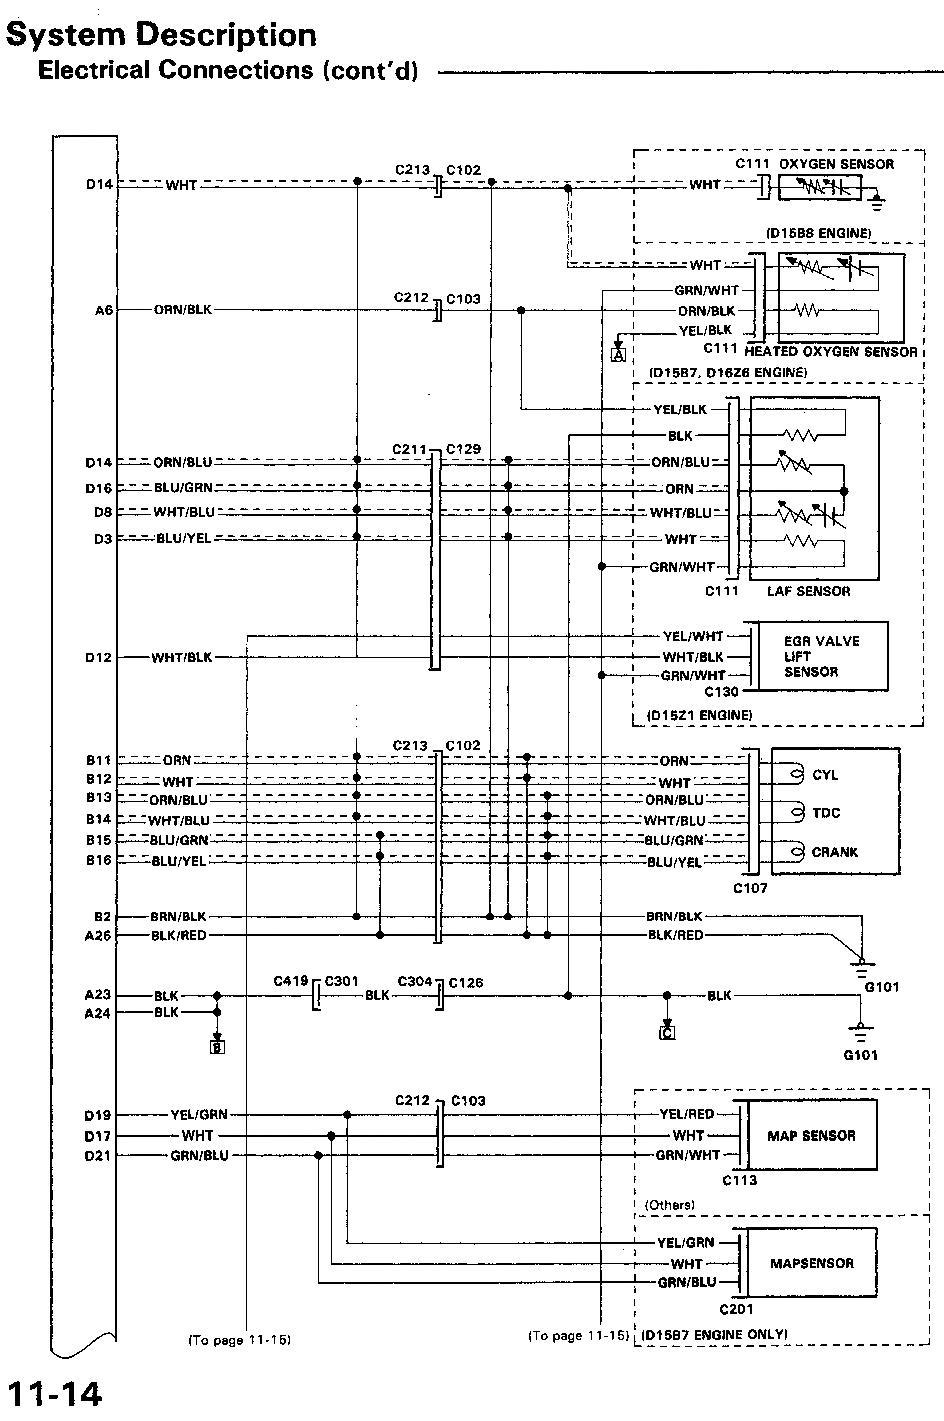 Marvellous 1993 honda p28 ecu wiring diagram photos best image magnificent b16 ecu wiring diagram gift electrical circuit diagram swarovskicordoba Gallery